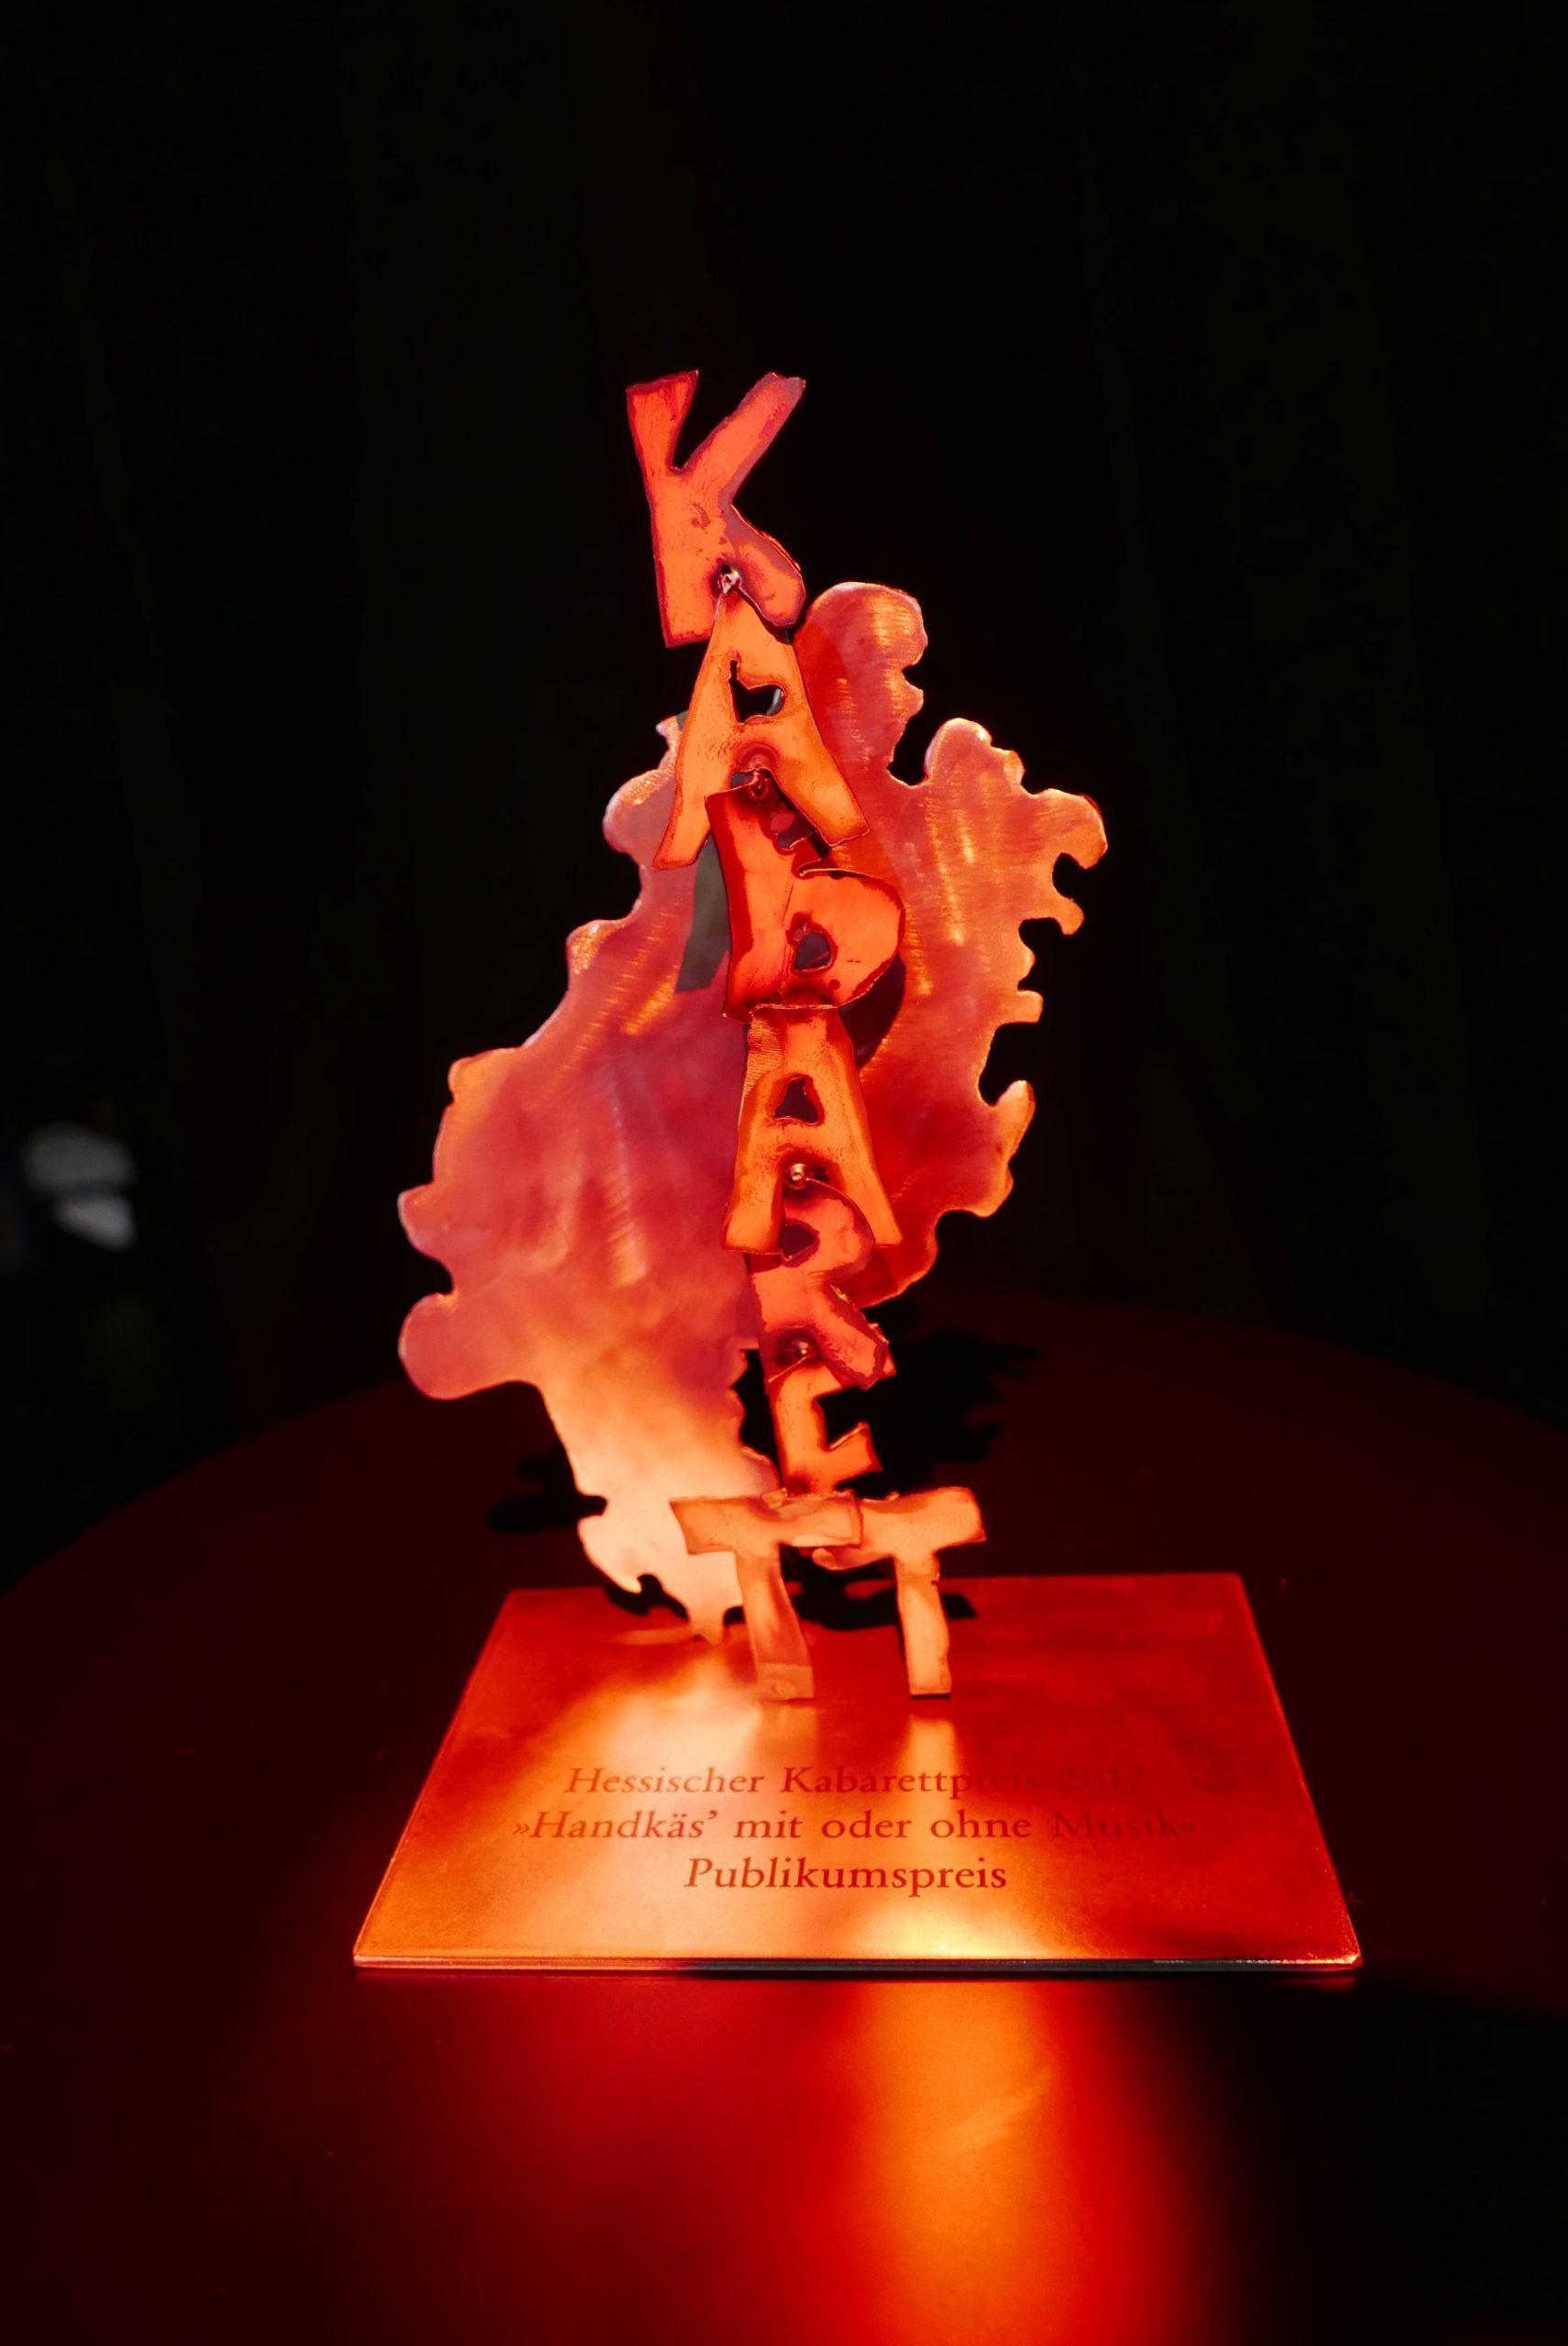 Gala zum Hessischen Kabarettpreis 2020 muss verschoben werden